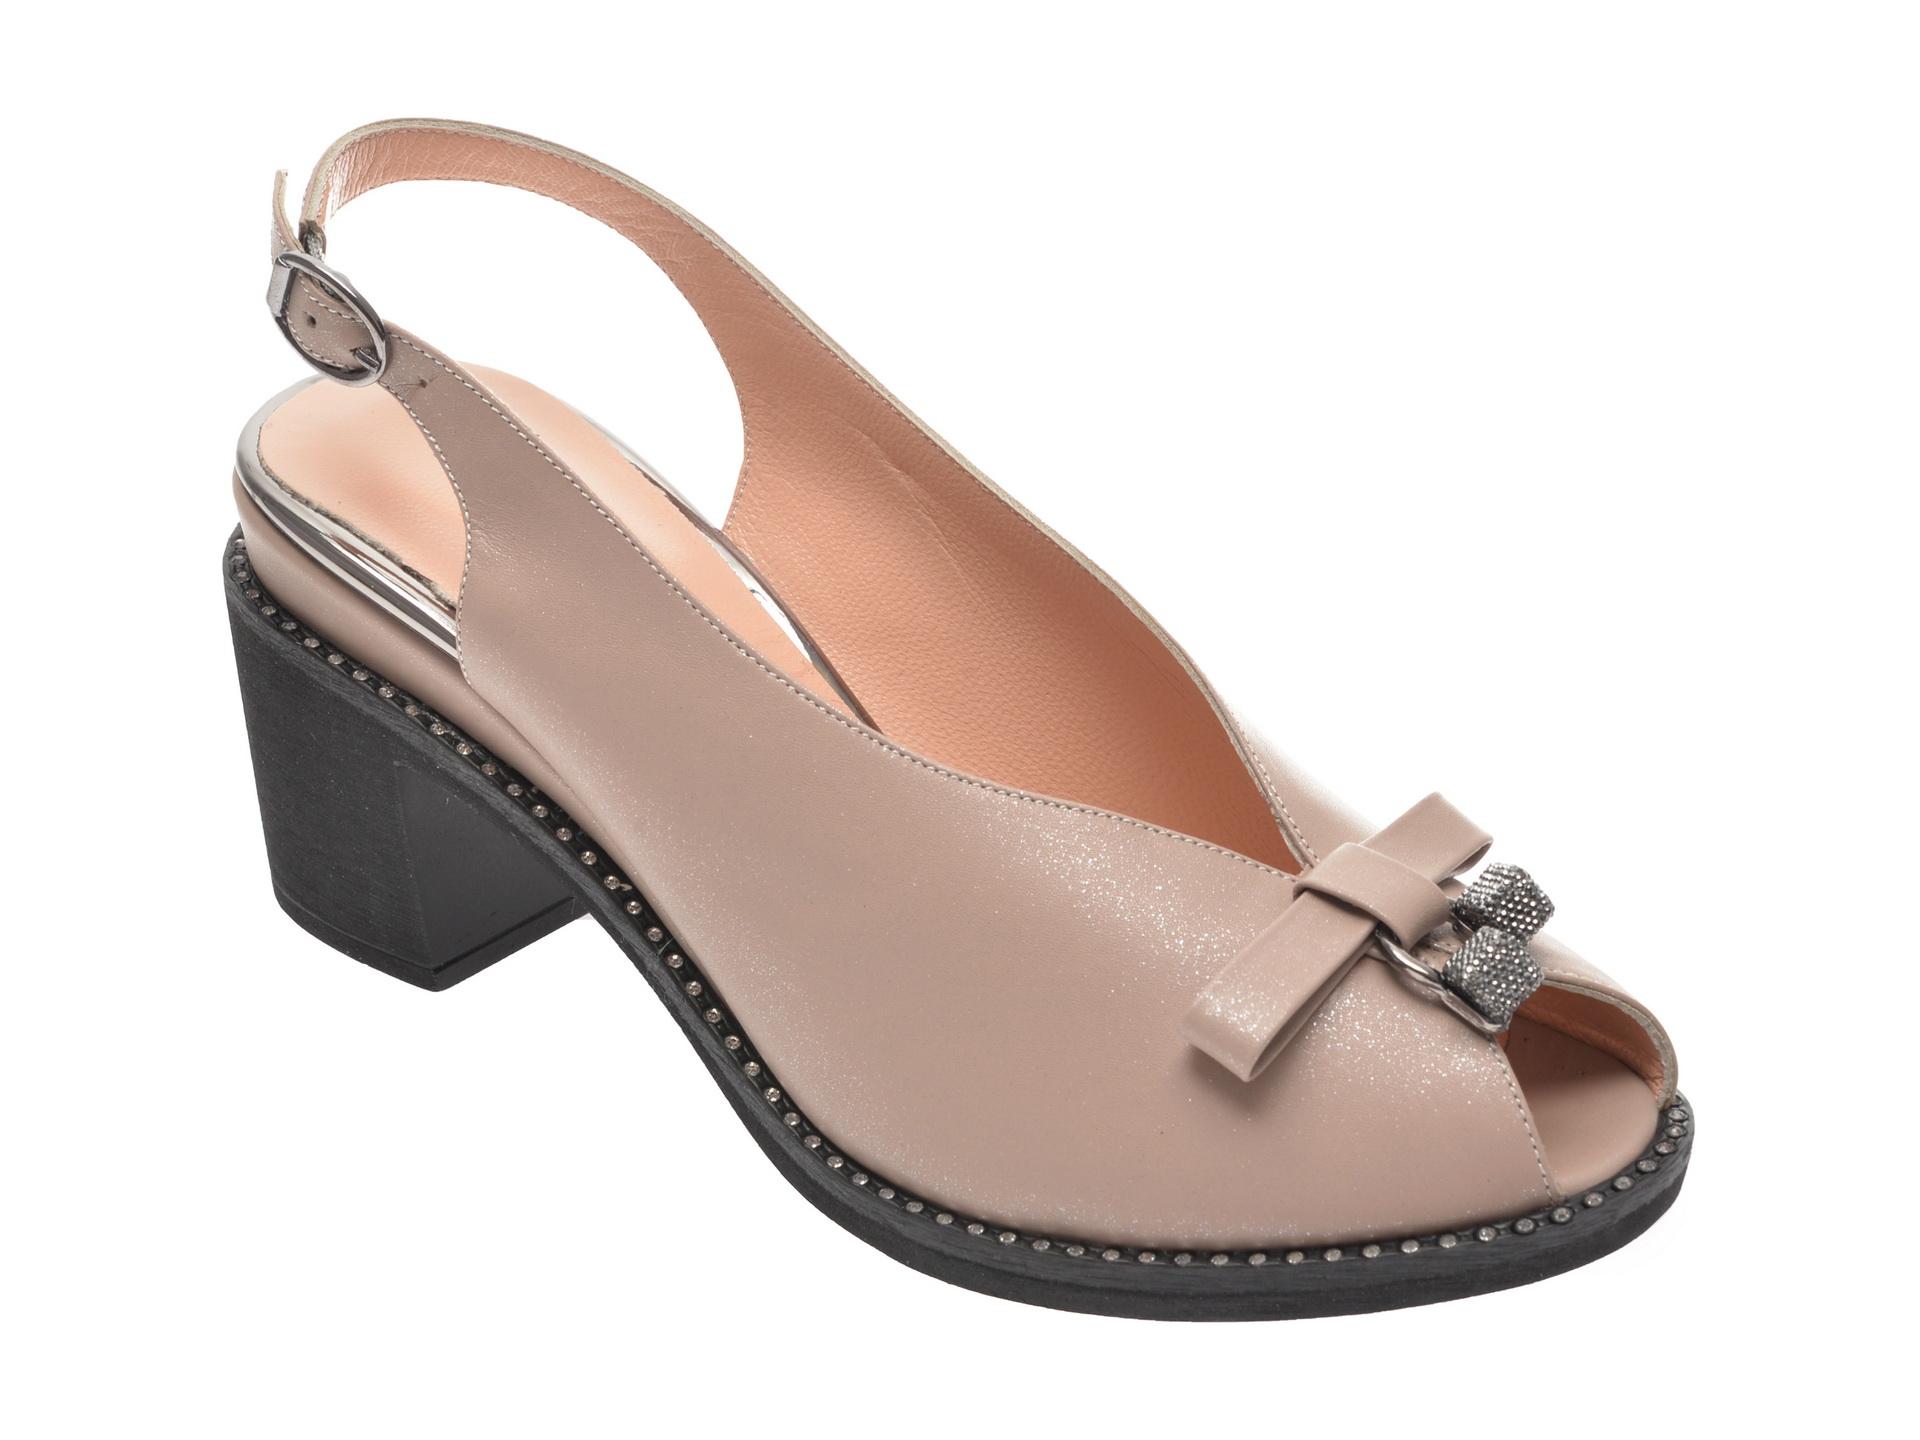 Sandale FLAVIA PASSINI bej, 285281, din piele naturala